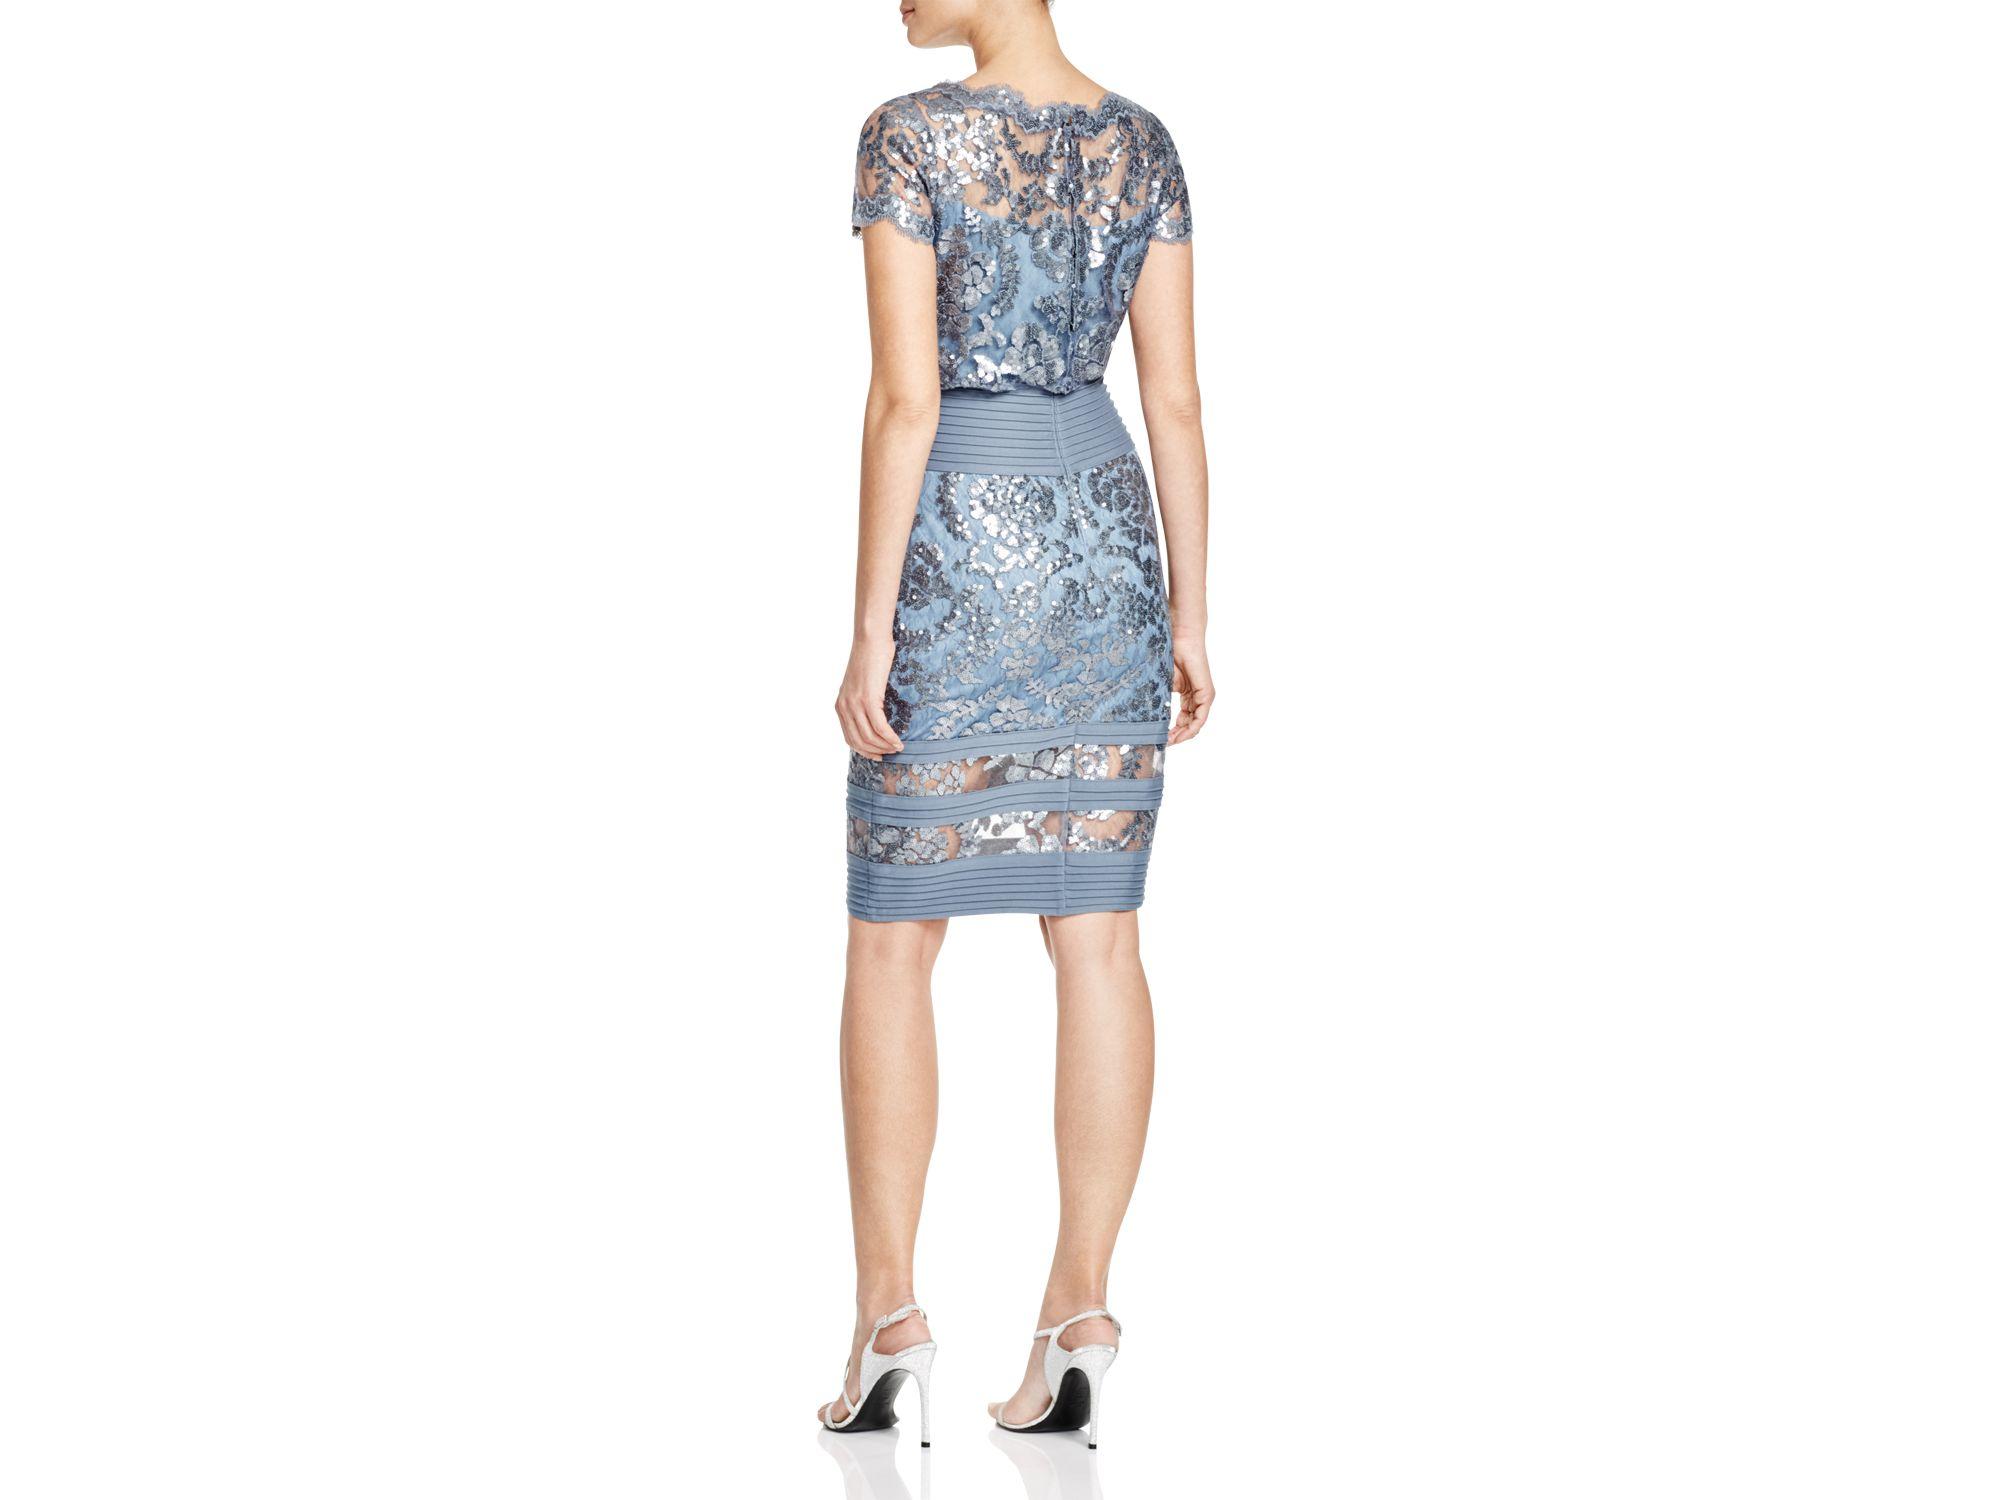 Short Sleeve Sequined Lace Blouson Dress